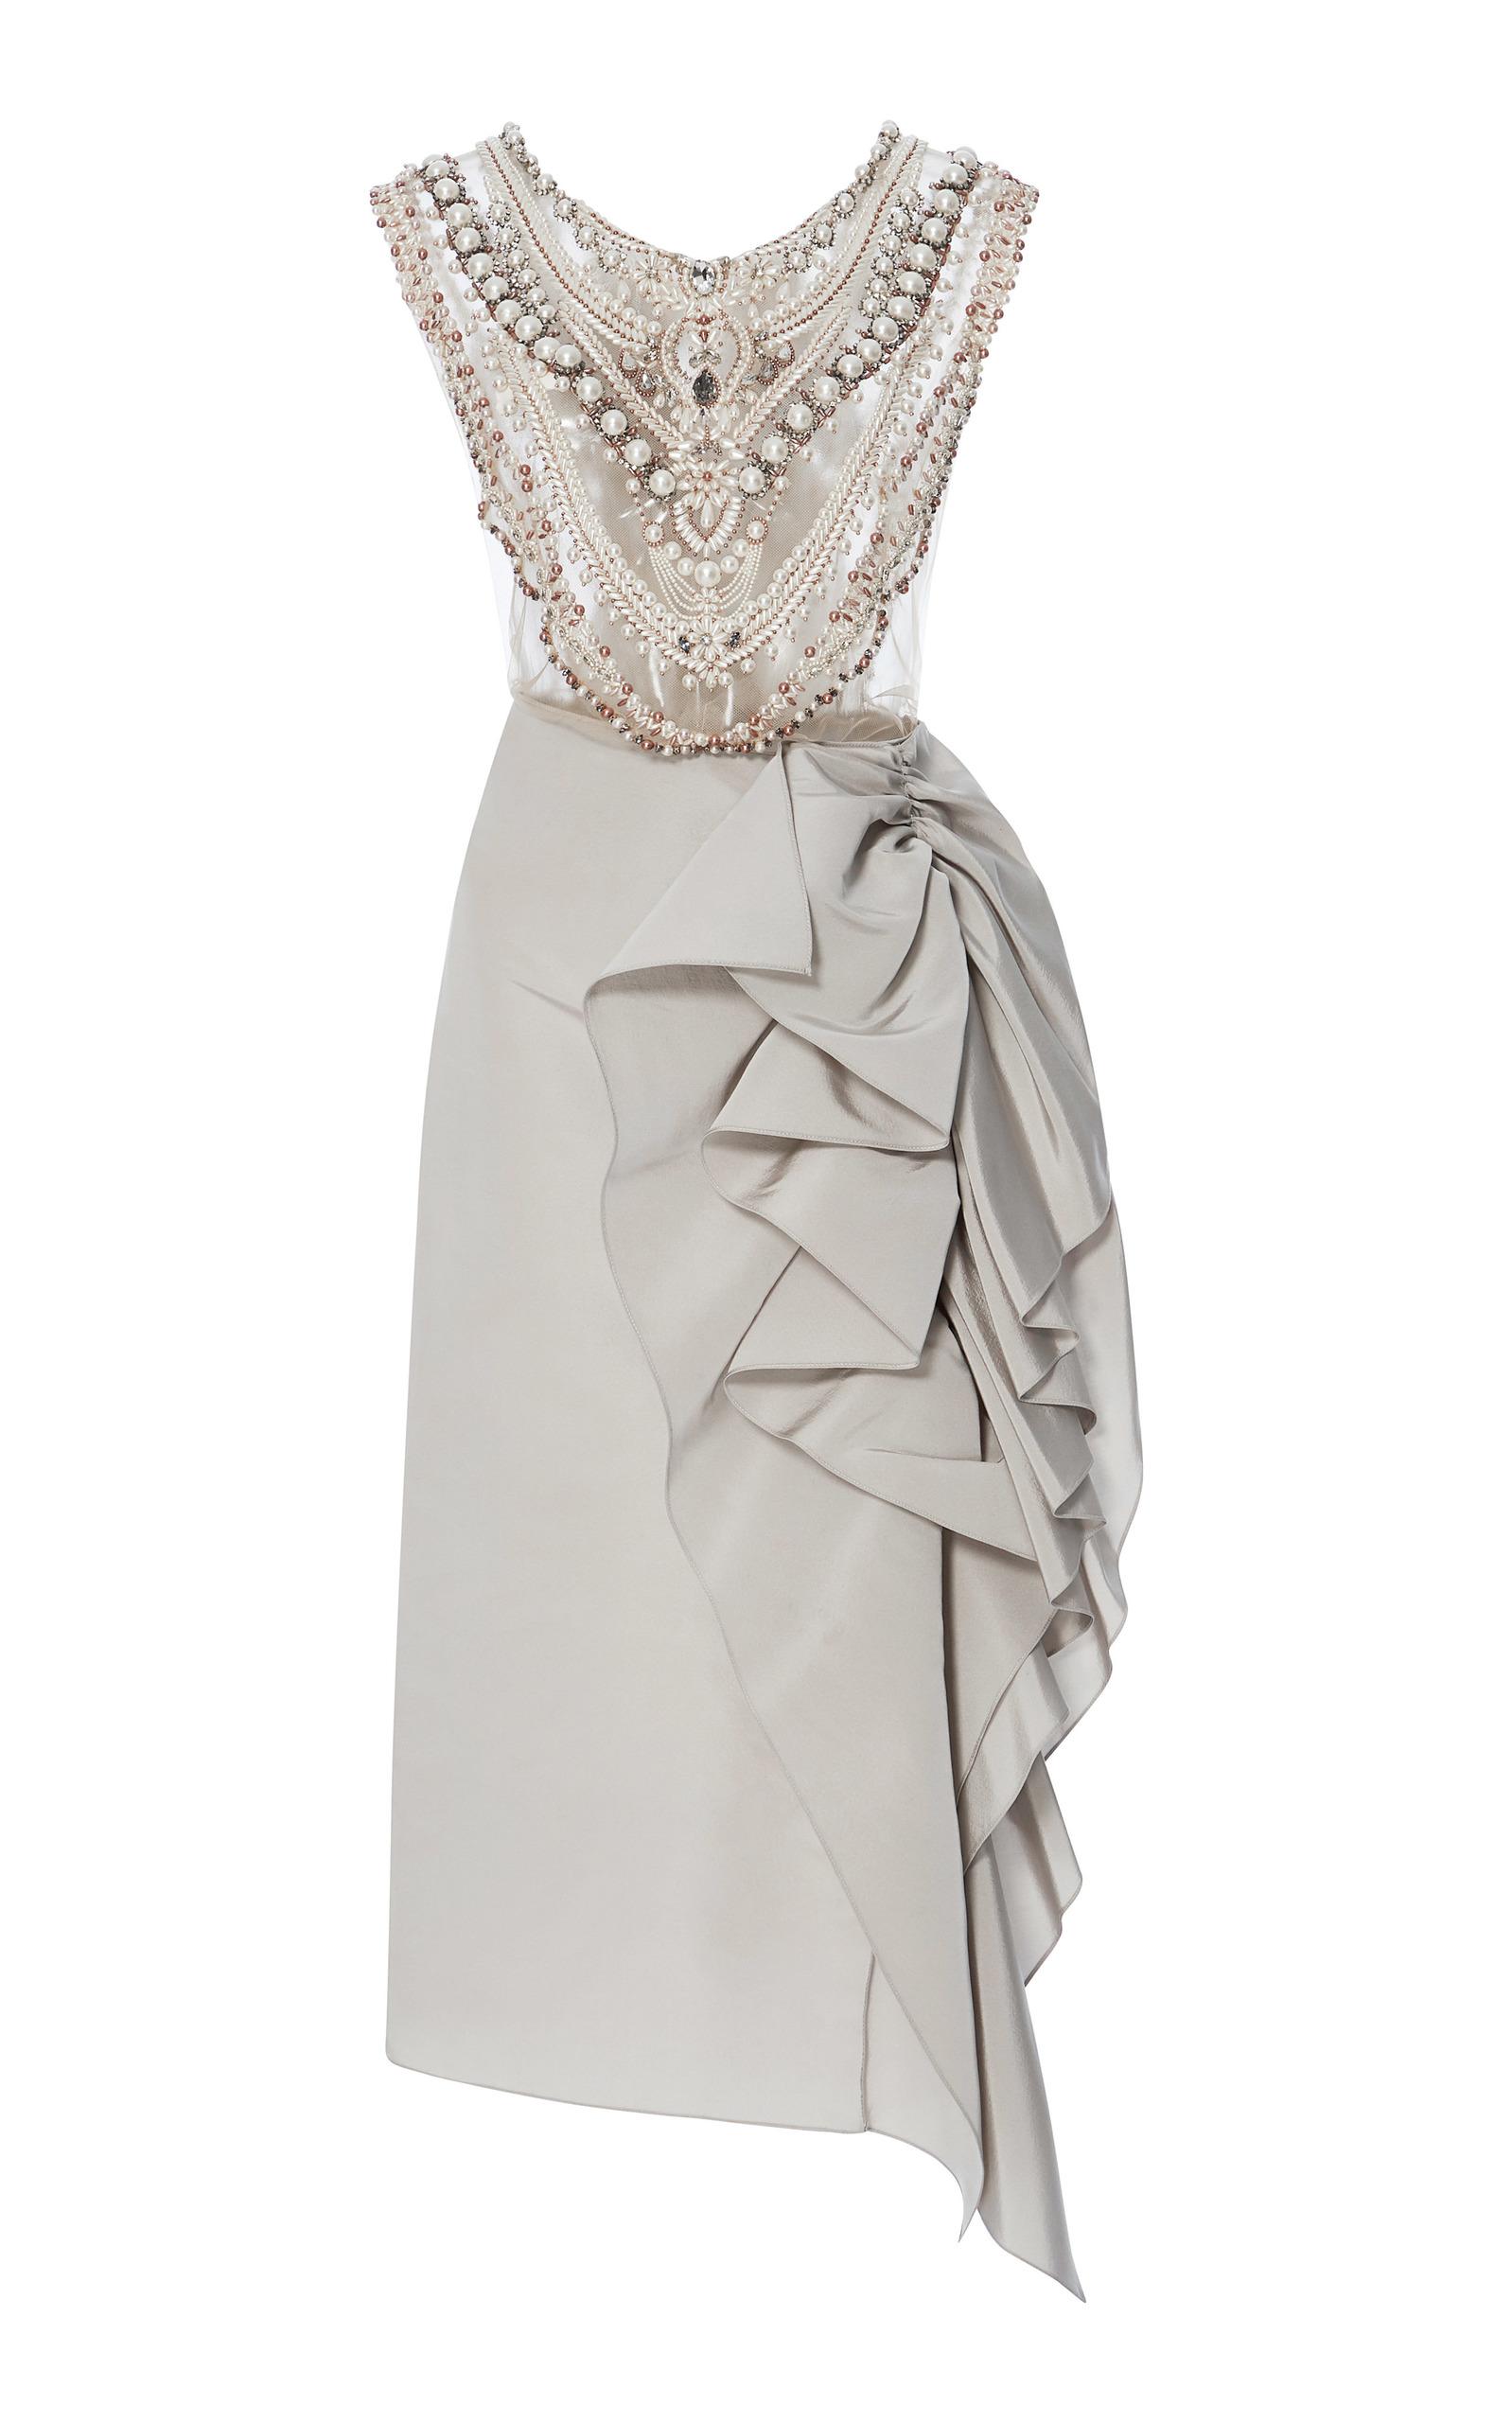 Pearl Cocktail Dress